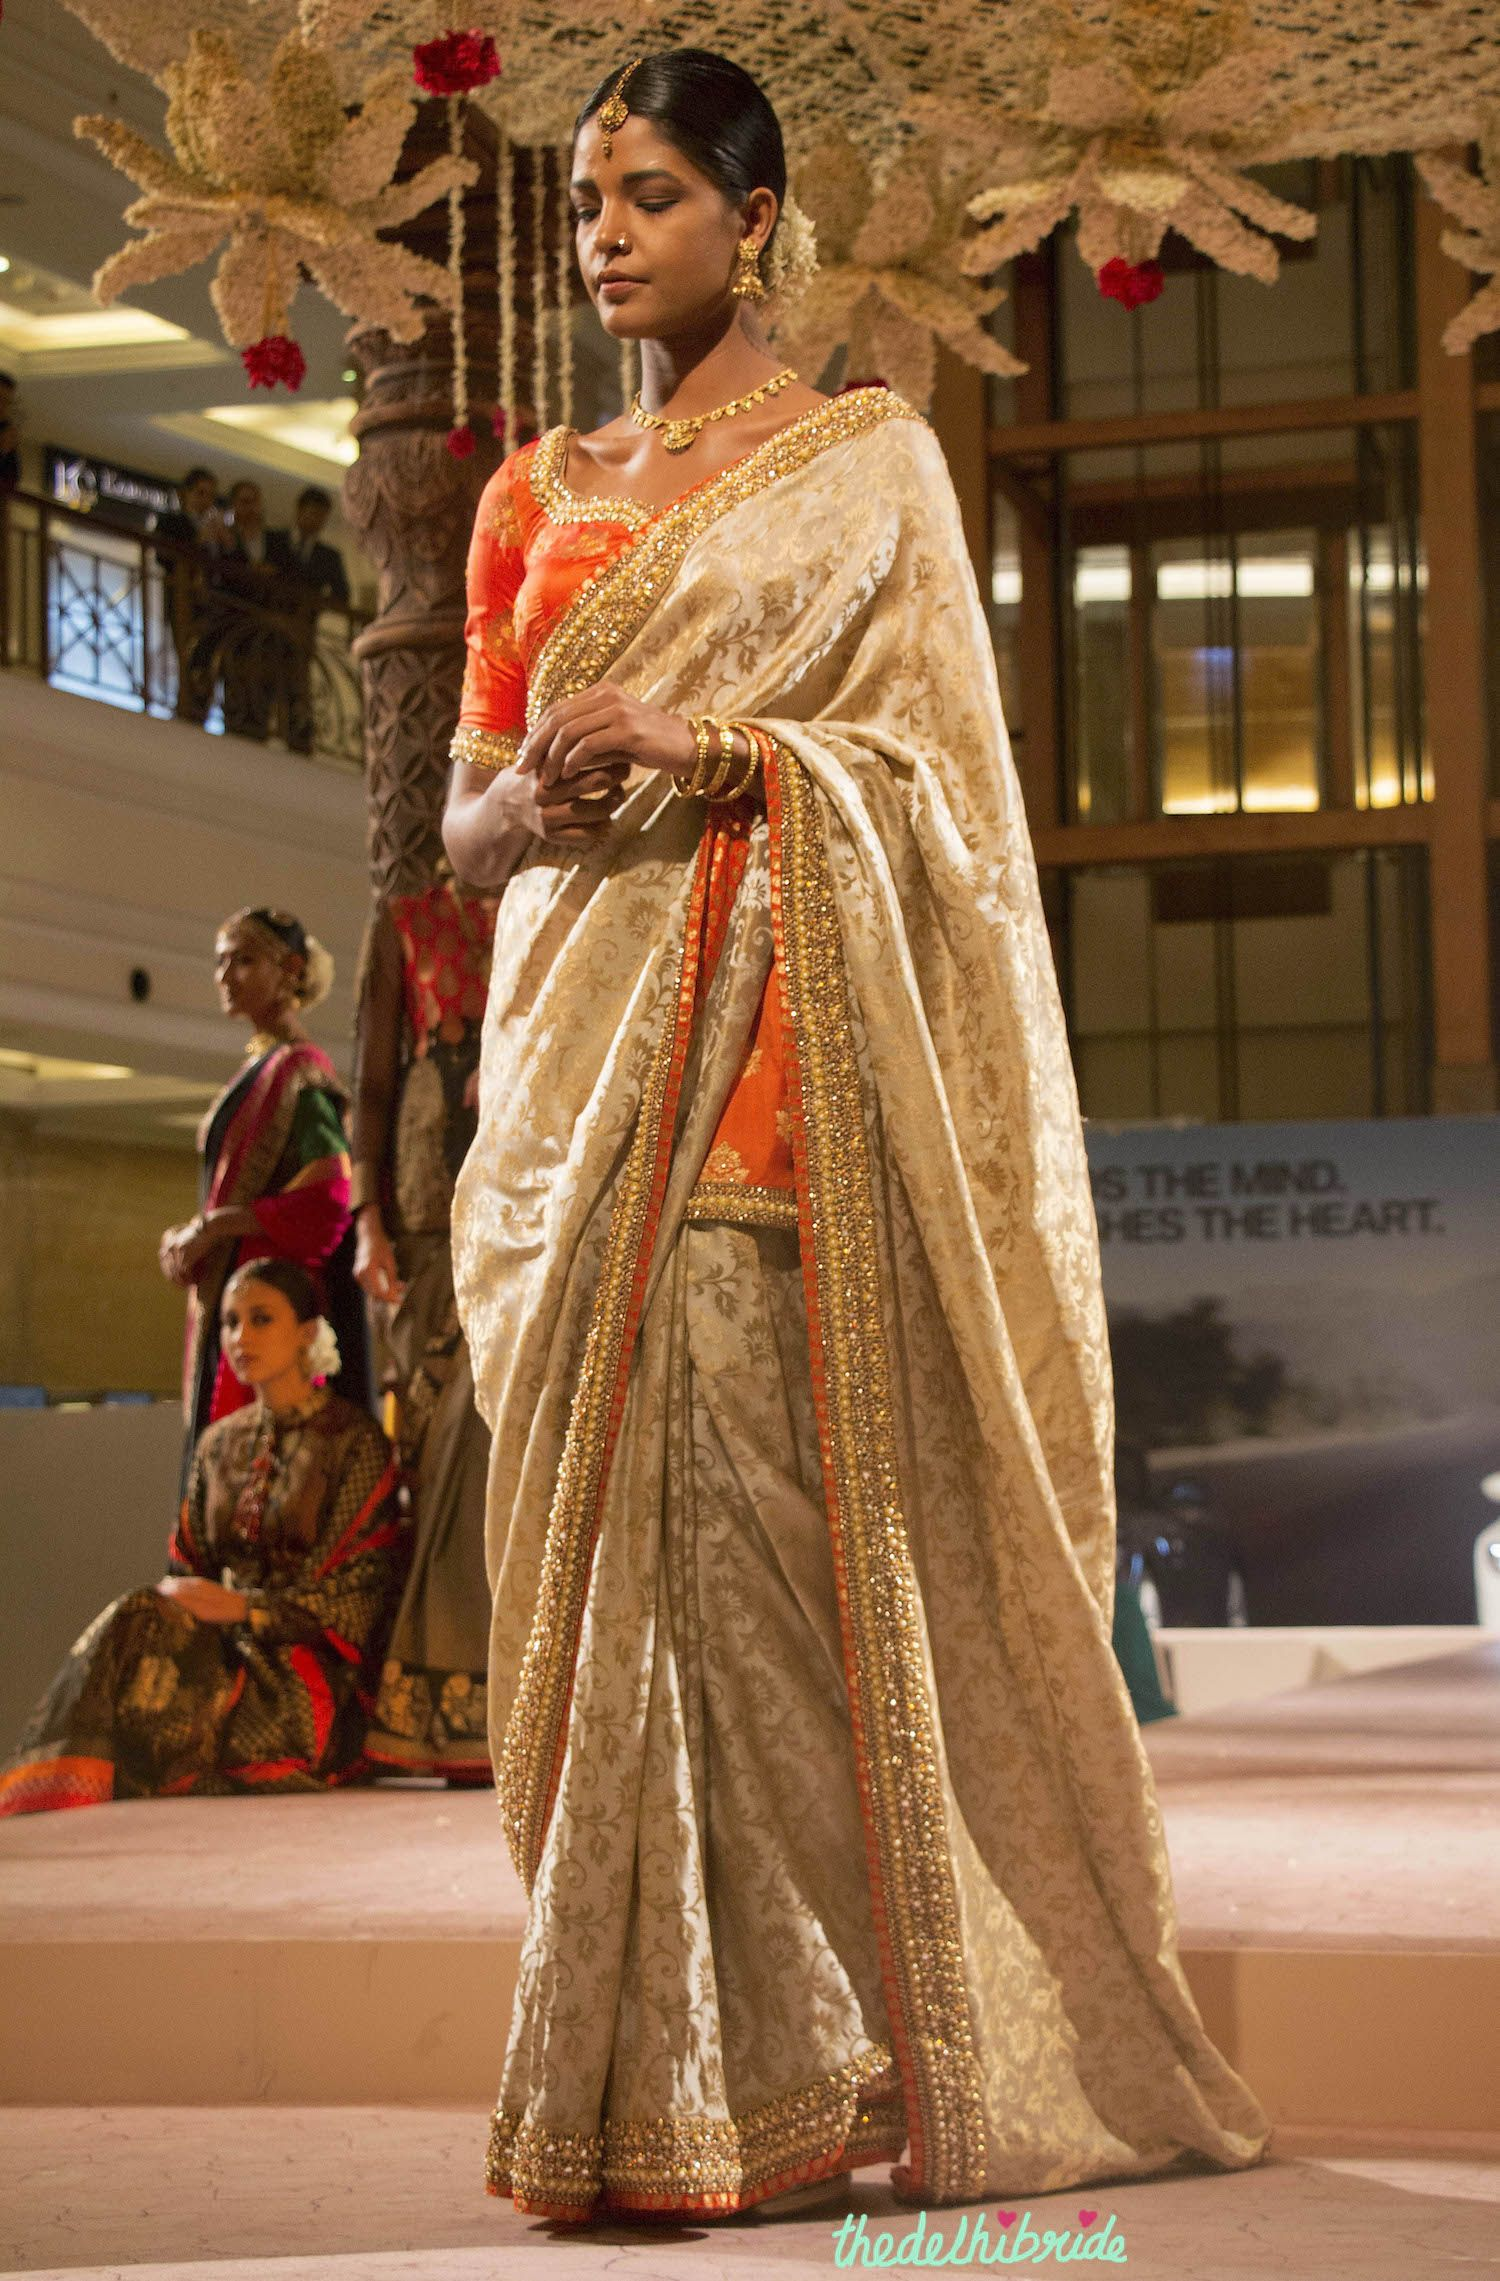 Ashima Leena - Ivory & Gold Saree With Orange Blouse at BMW India Bridal Fashion Week 2015